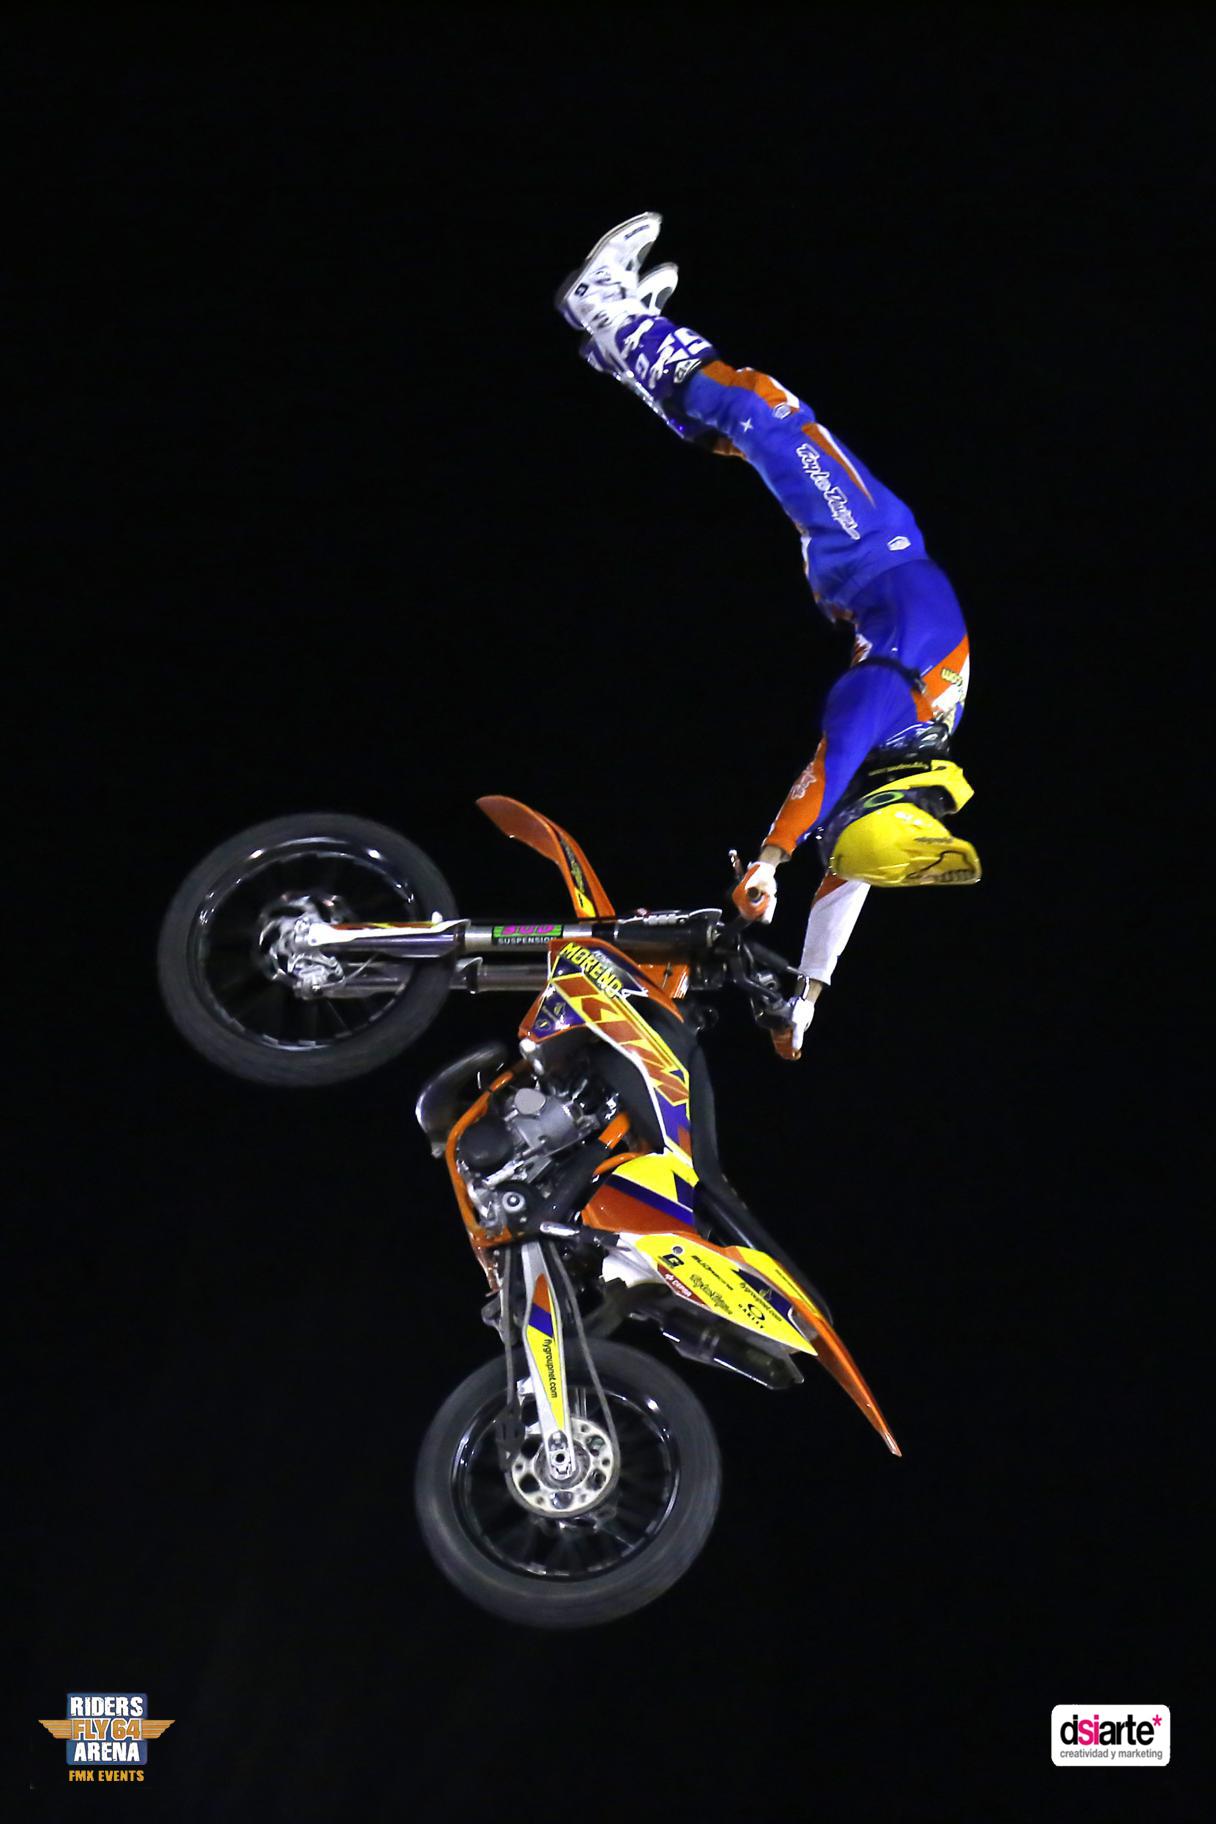 Fotografía publicitaria de eventos en Albacete Summer Night Tour 2015, freestyle motocross cup 2015